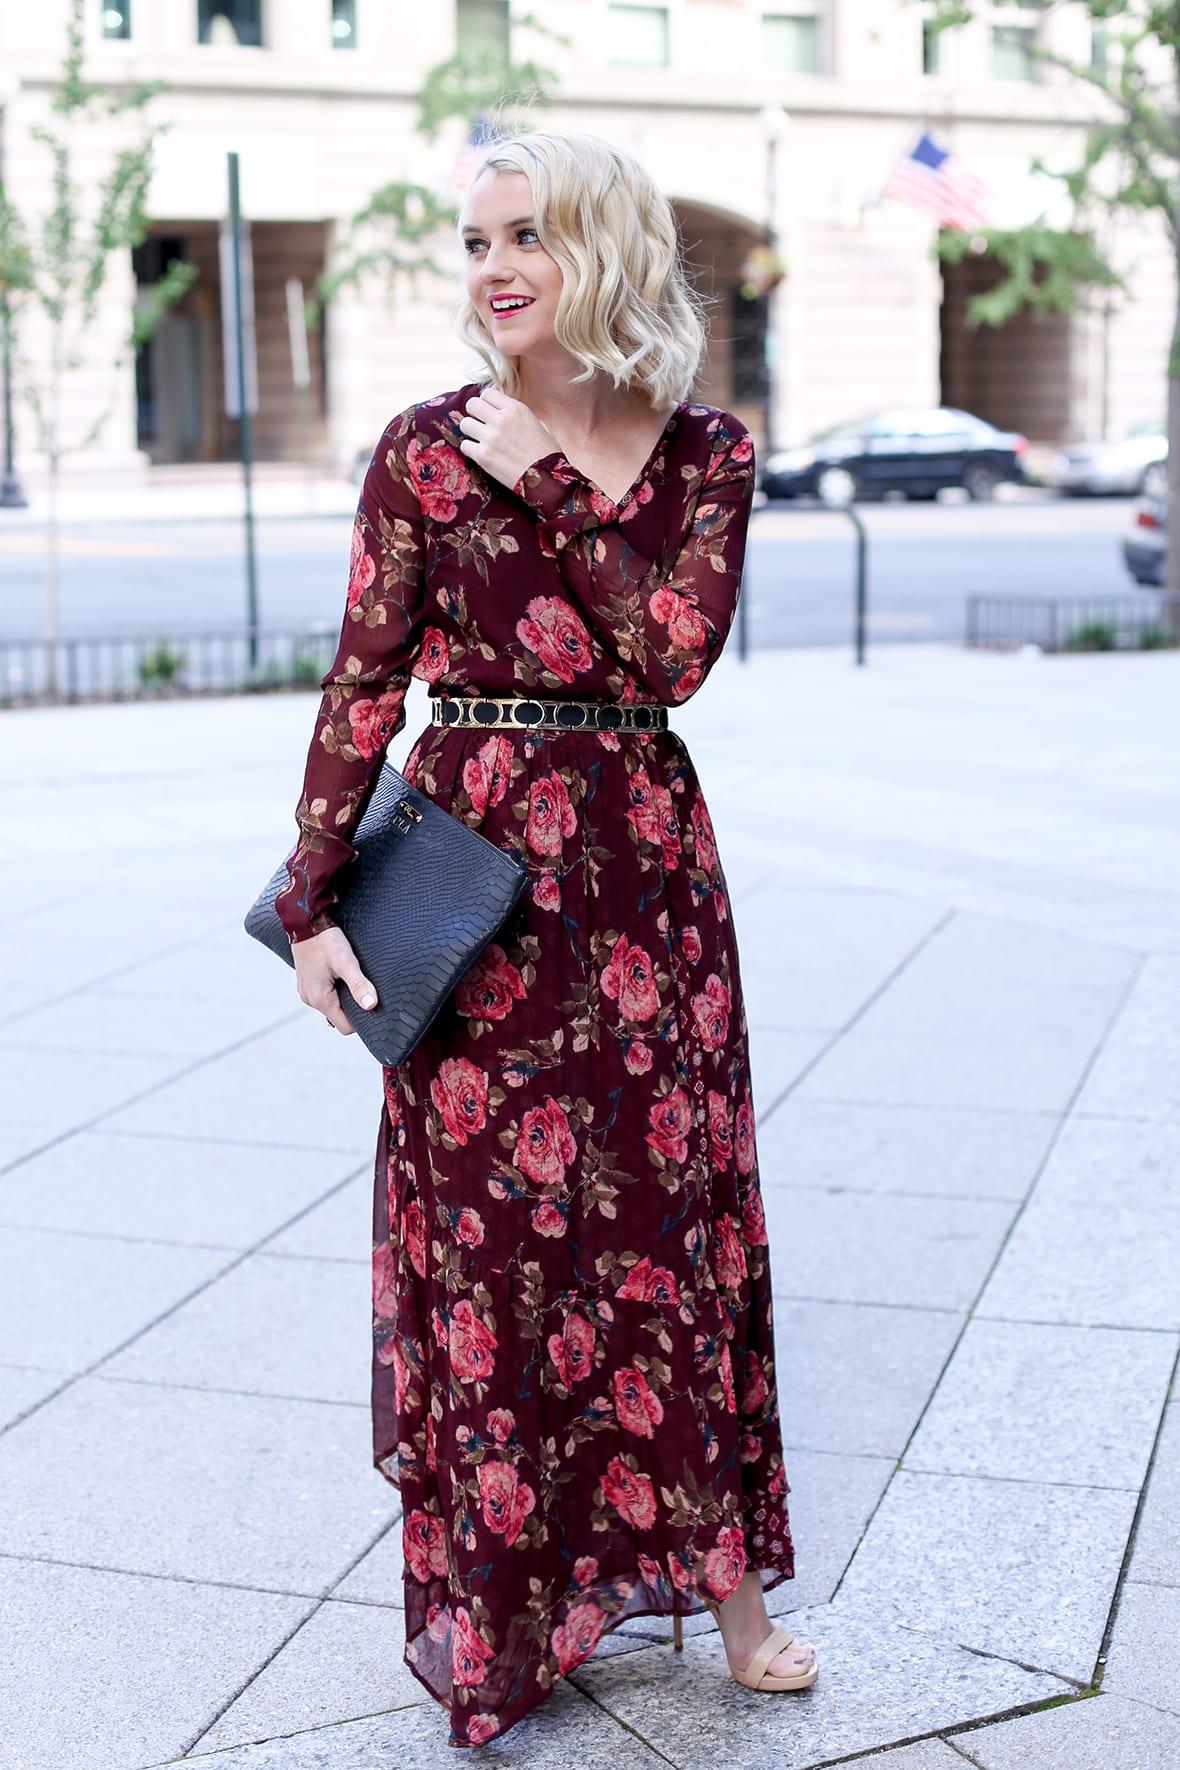 Floral maxi dress fall